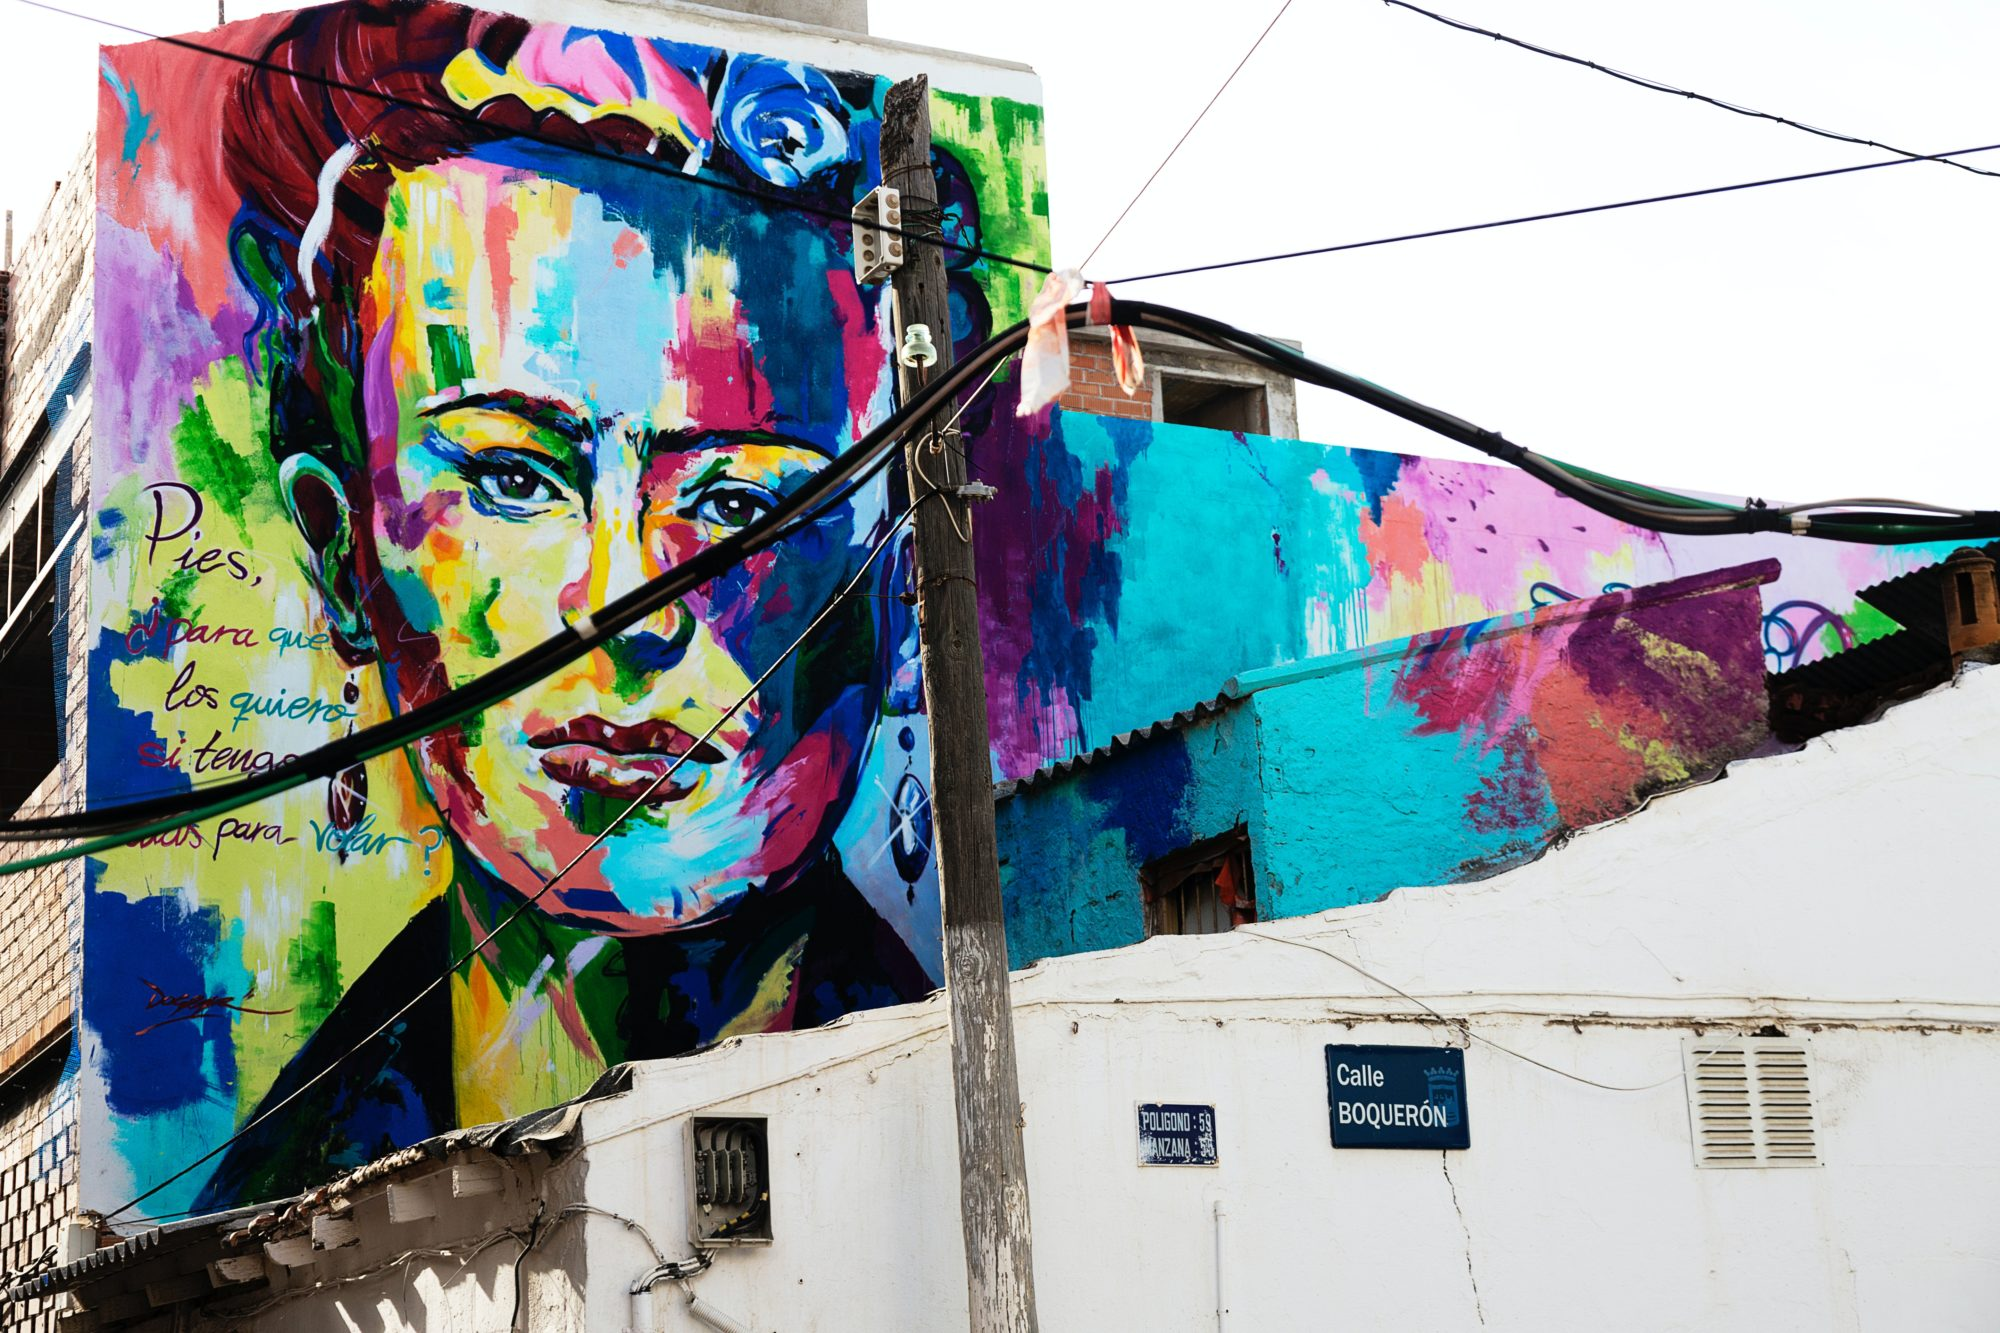 Frida Kahlo Wandbild in Malaga: